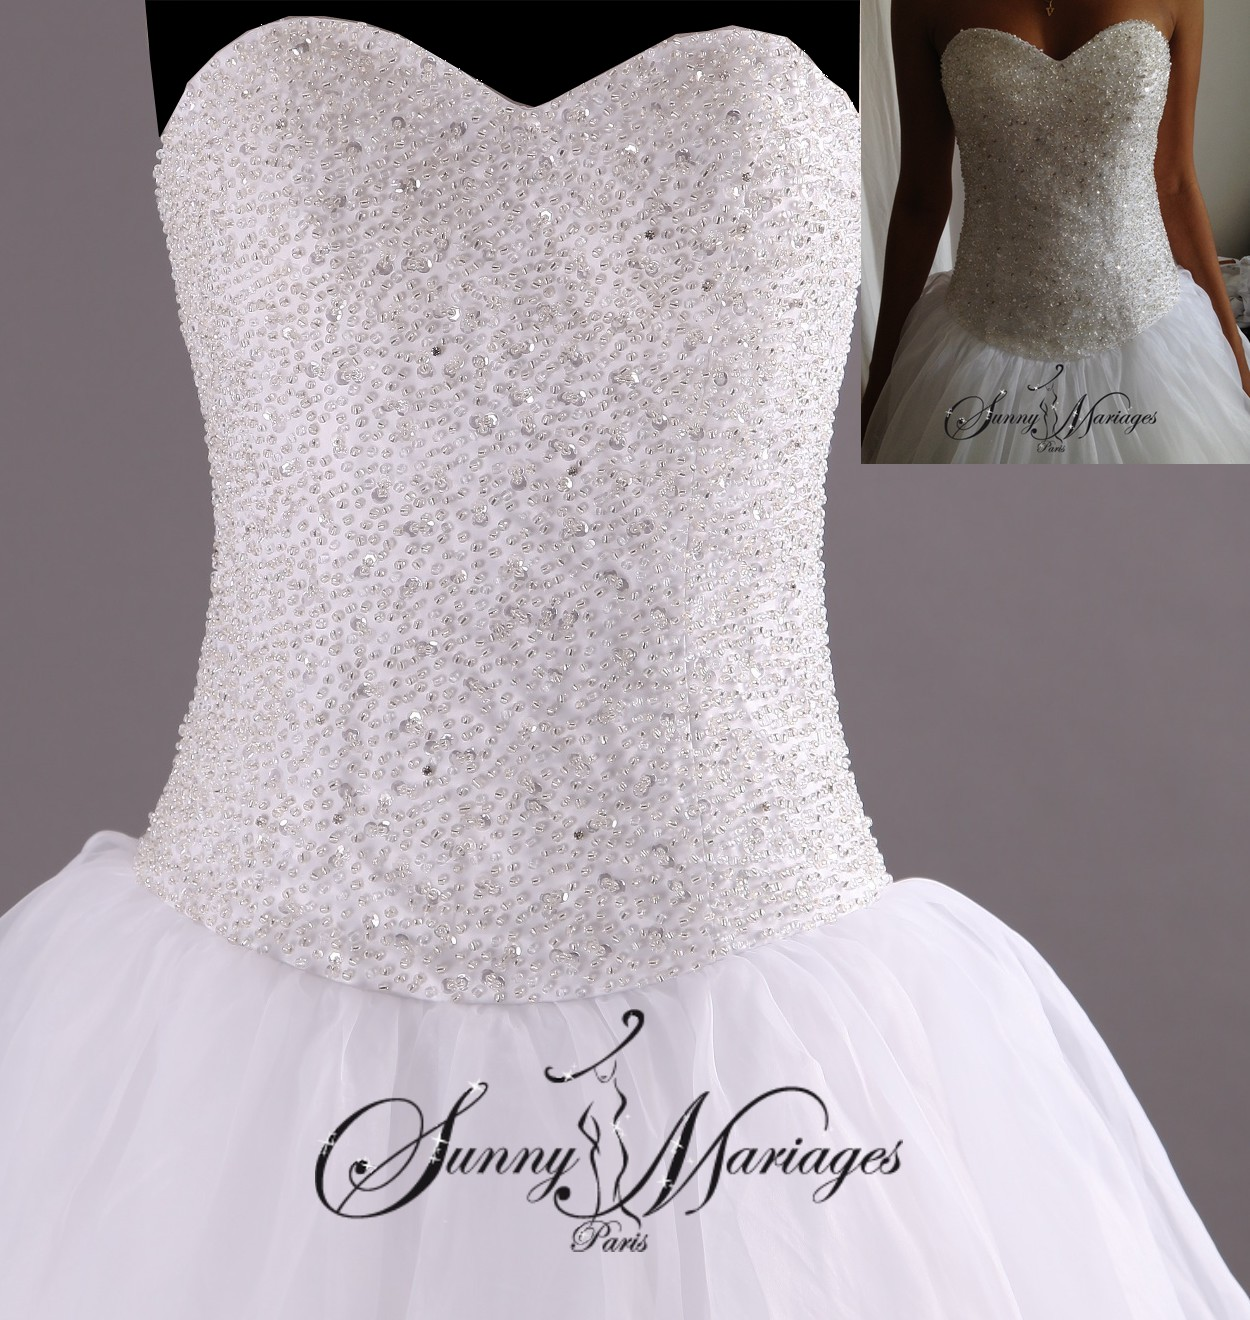 robe de mariee princesse bustier strass et perles transparente (2)